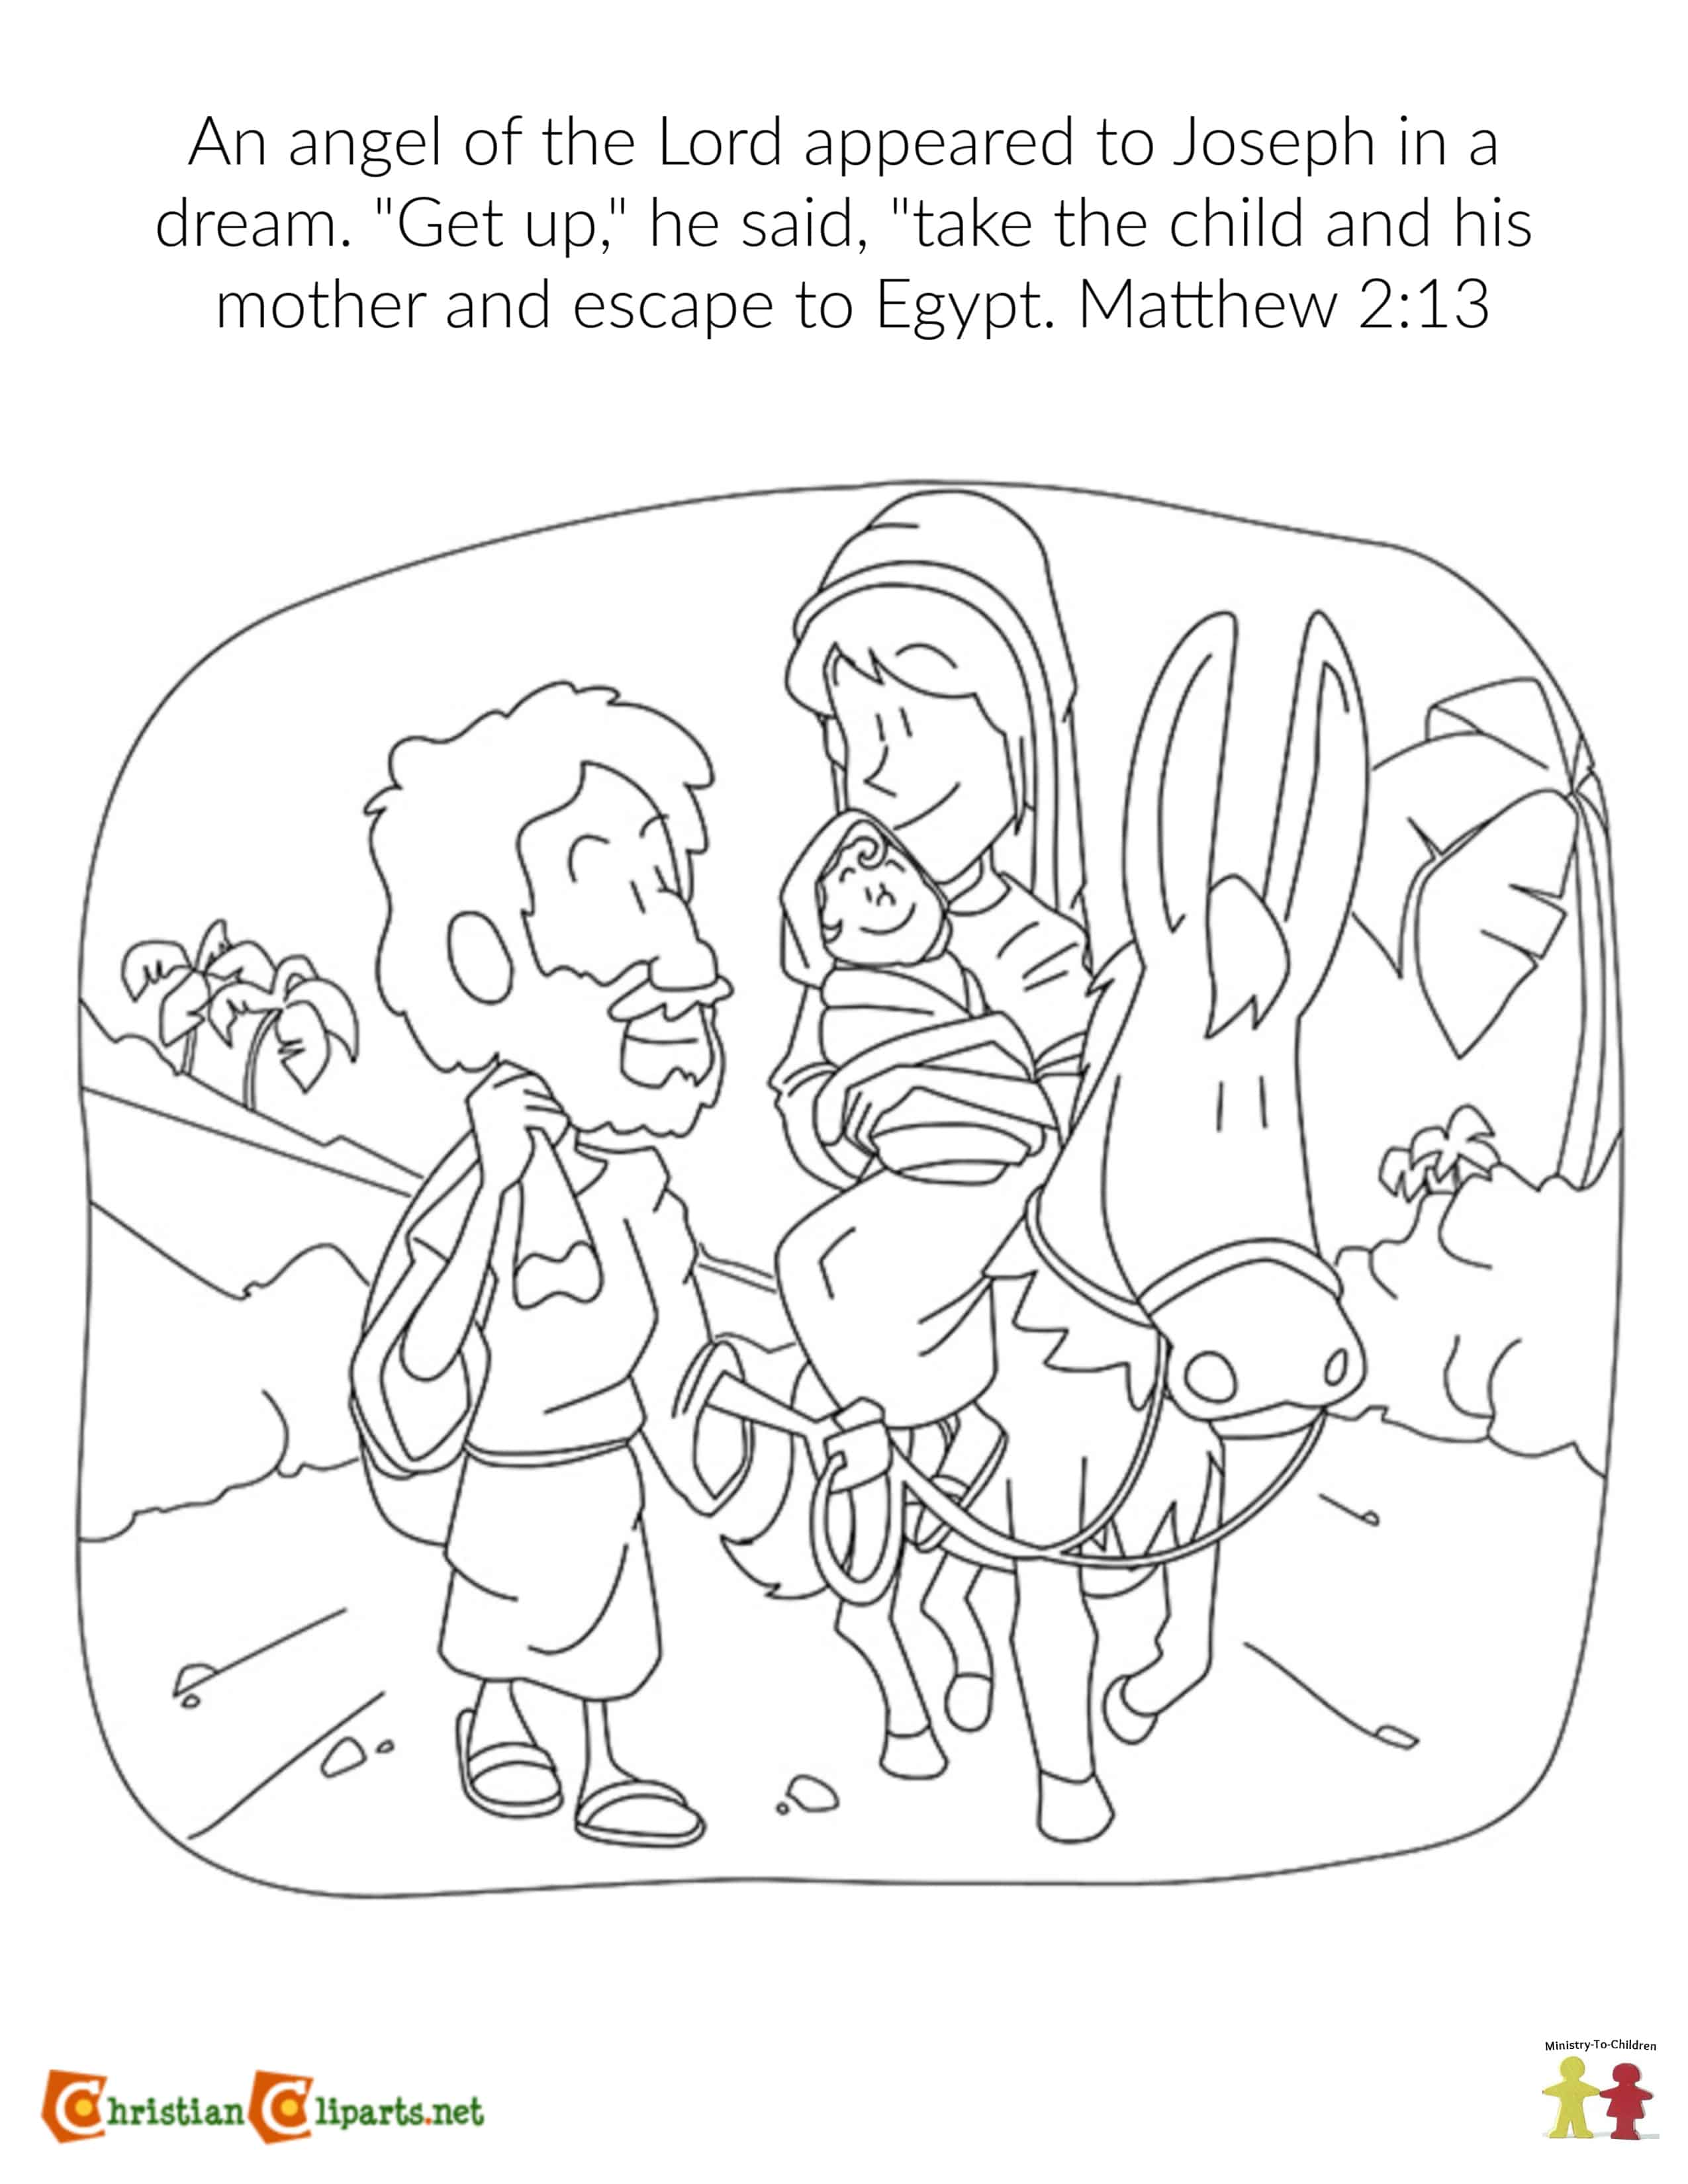 Mary and Joseph (The Birth of Jesus) Sunday School Lesson